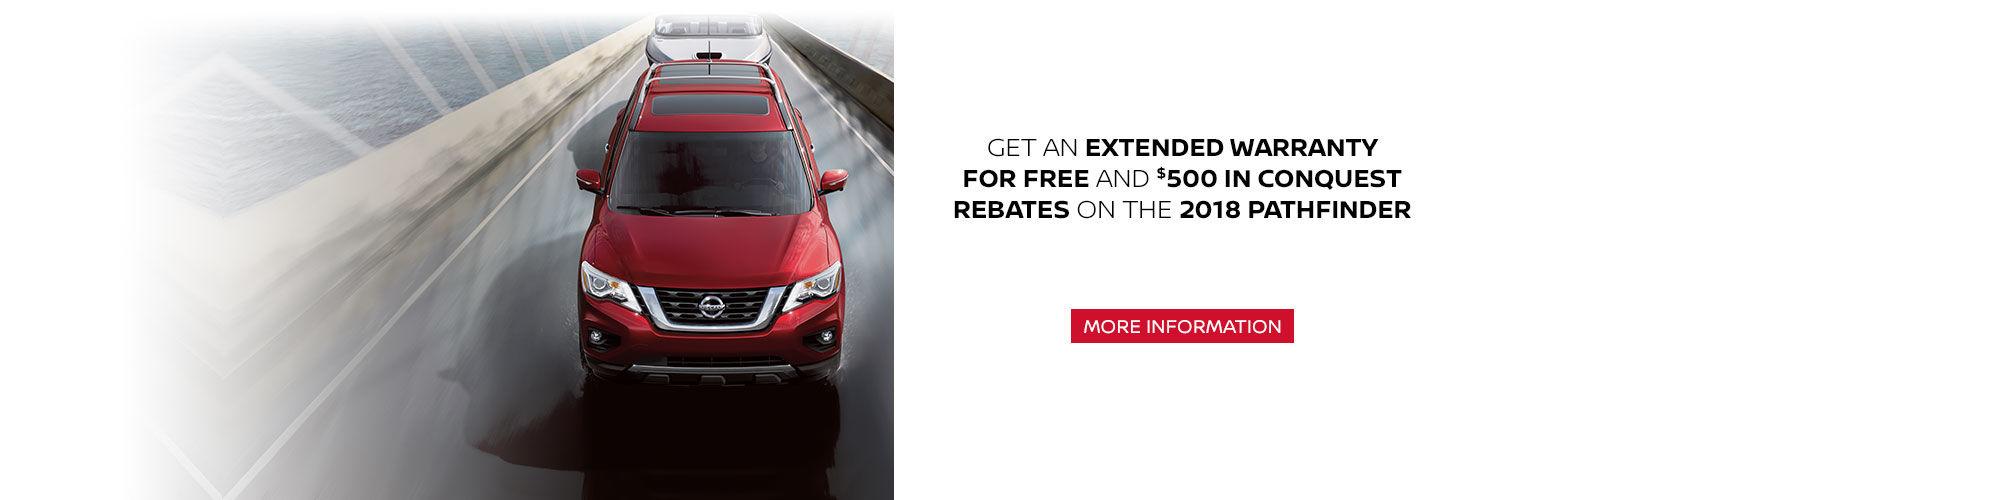 2018 Nissan Pathfinder Promotion